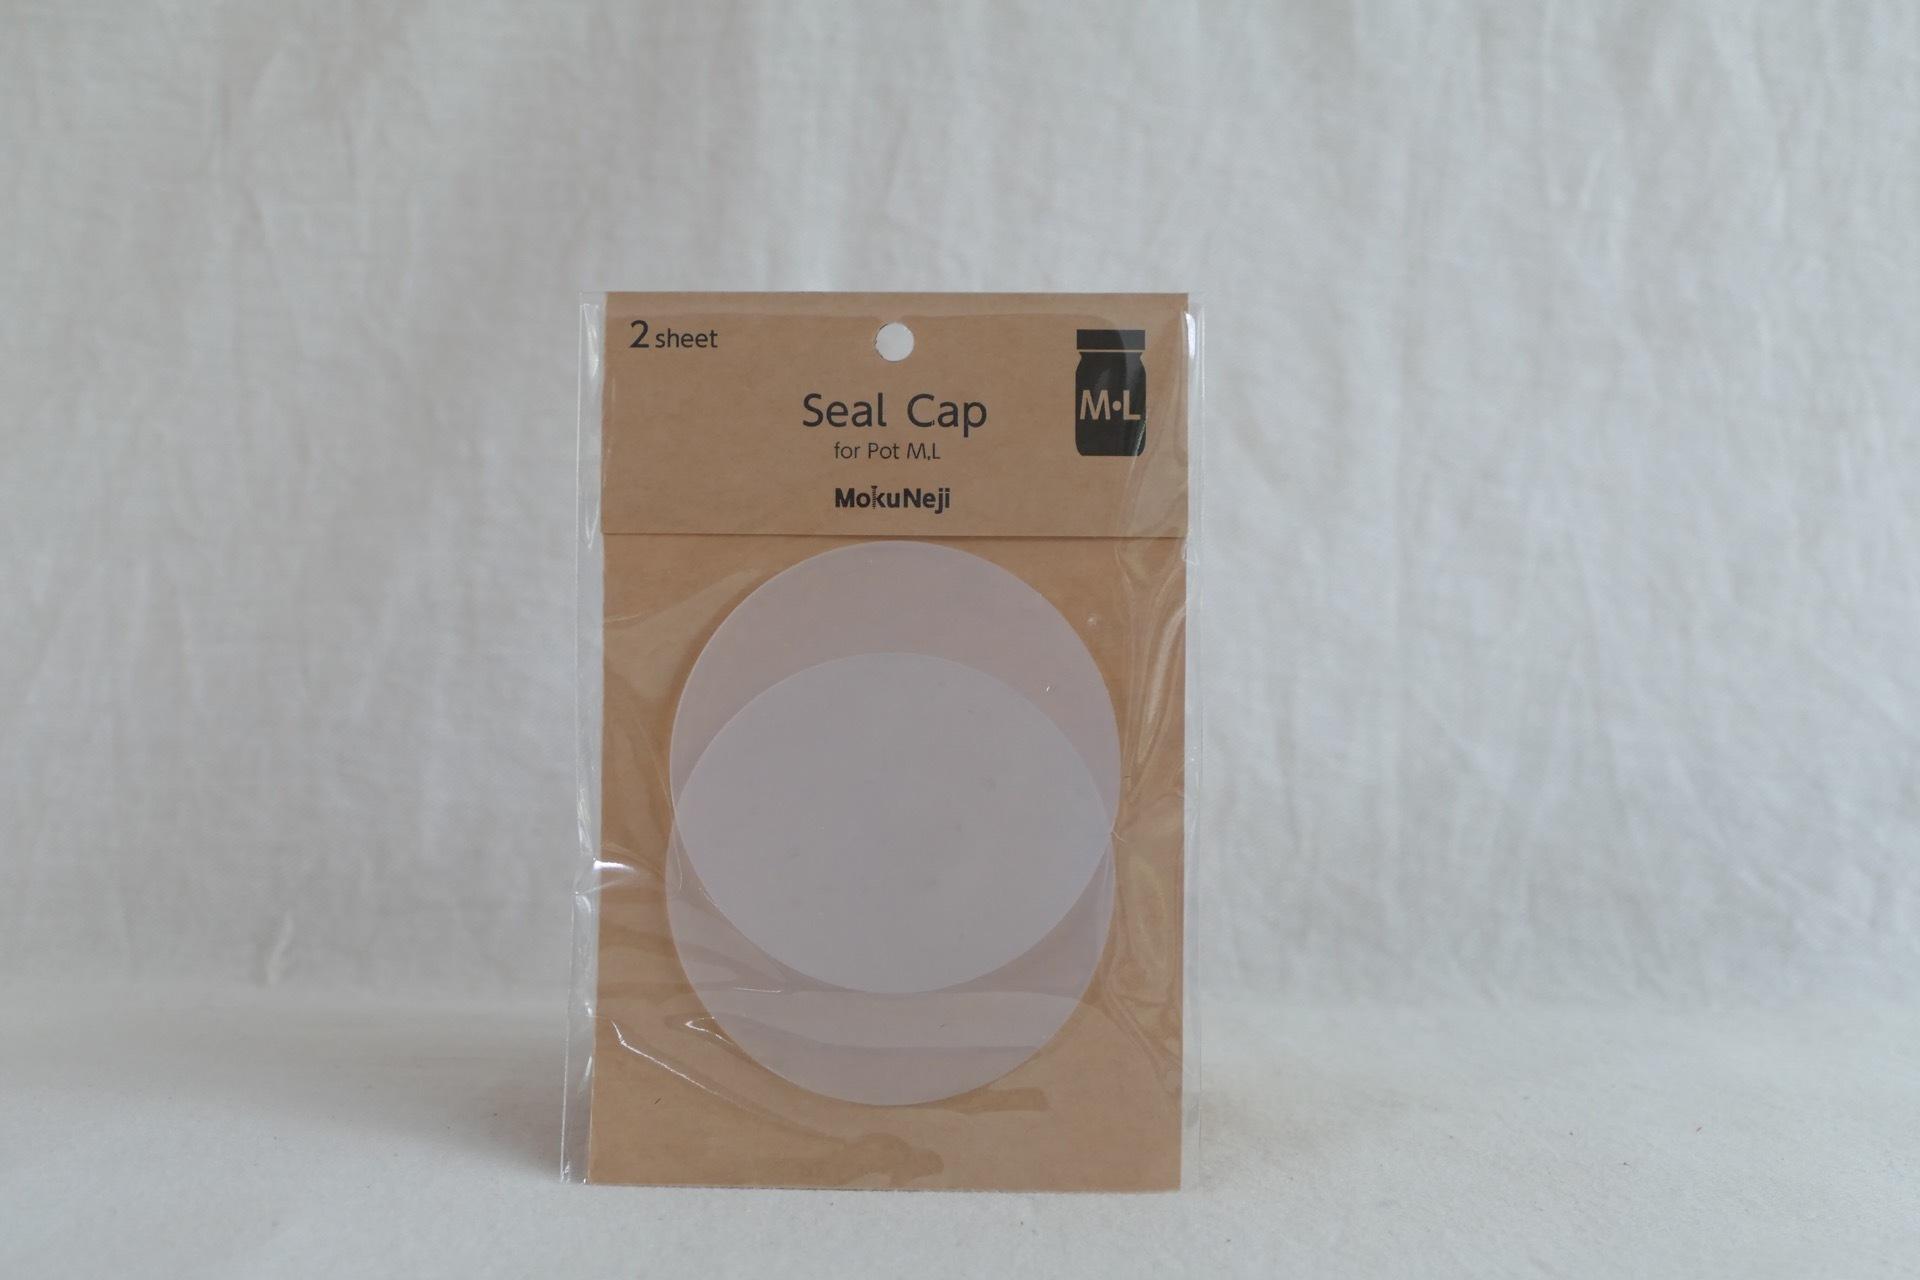 MokuNeji Seal Cap for Pot M,L / 2sheet